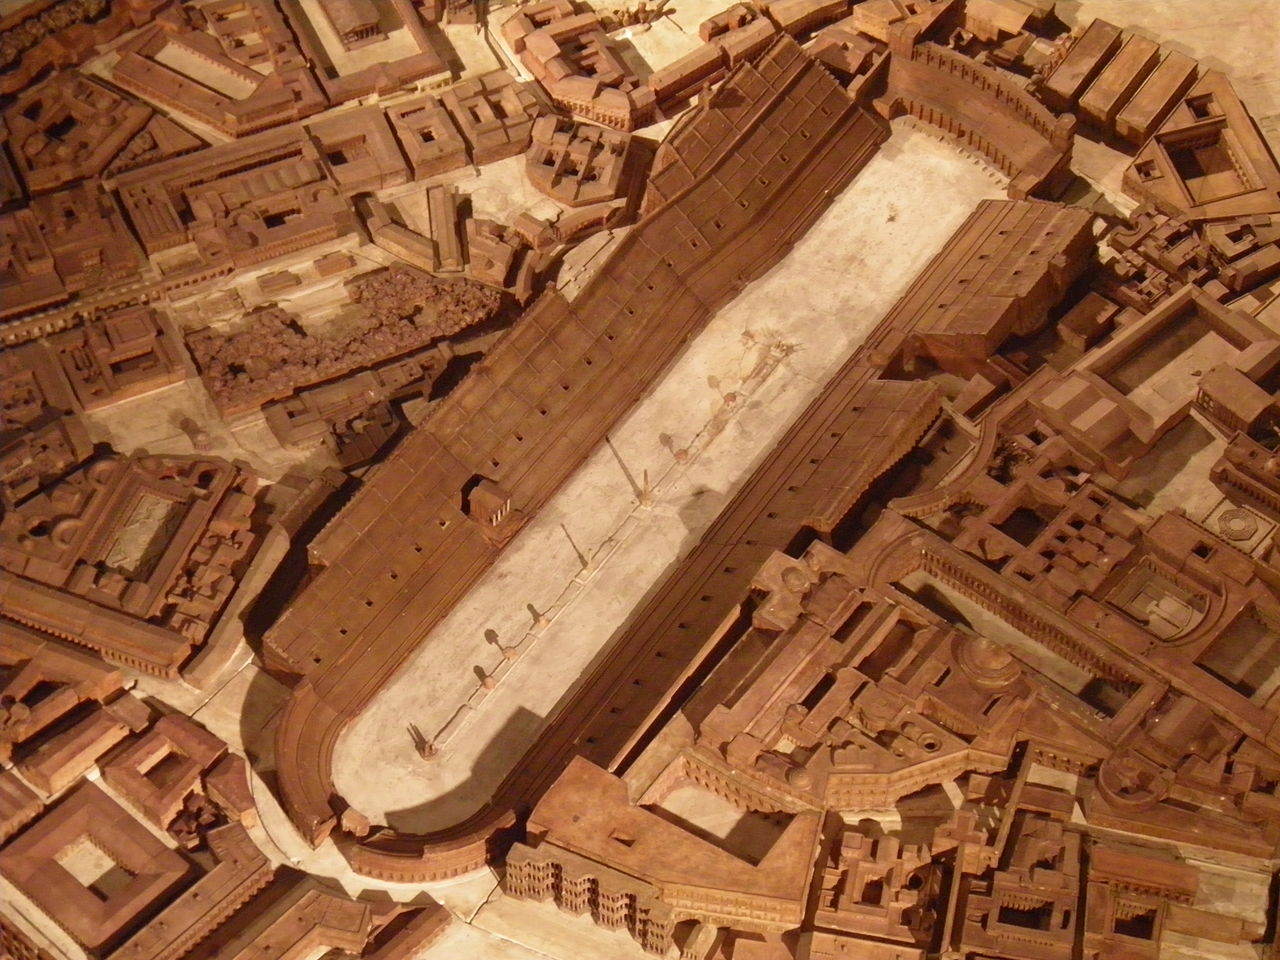 1280px-Circus_Maximus,_plan_de_Rome_de_Paul_Bigot,_université_de_Caen_MRSH.JPG